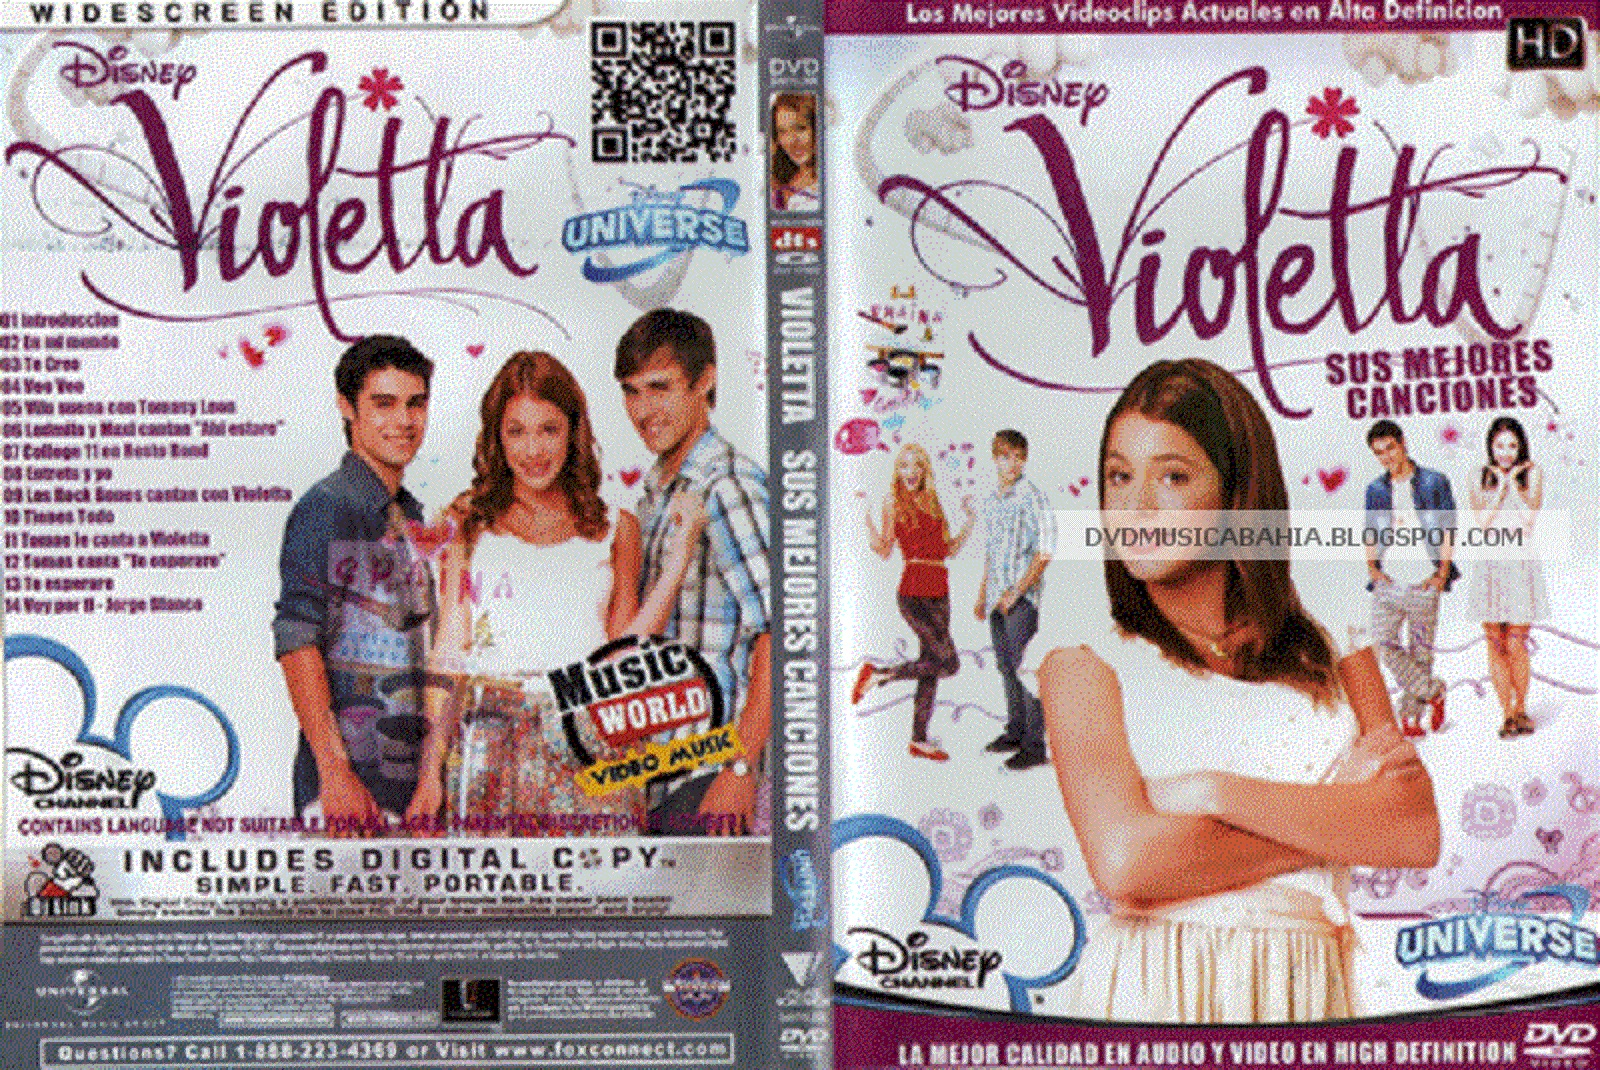 Musica De Violetta Veo Veo